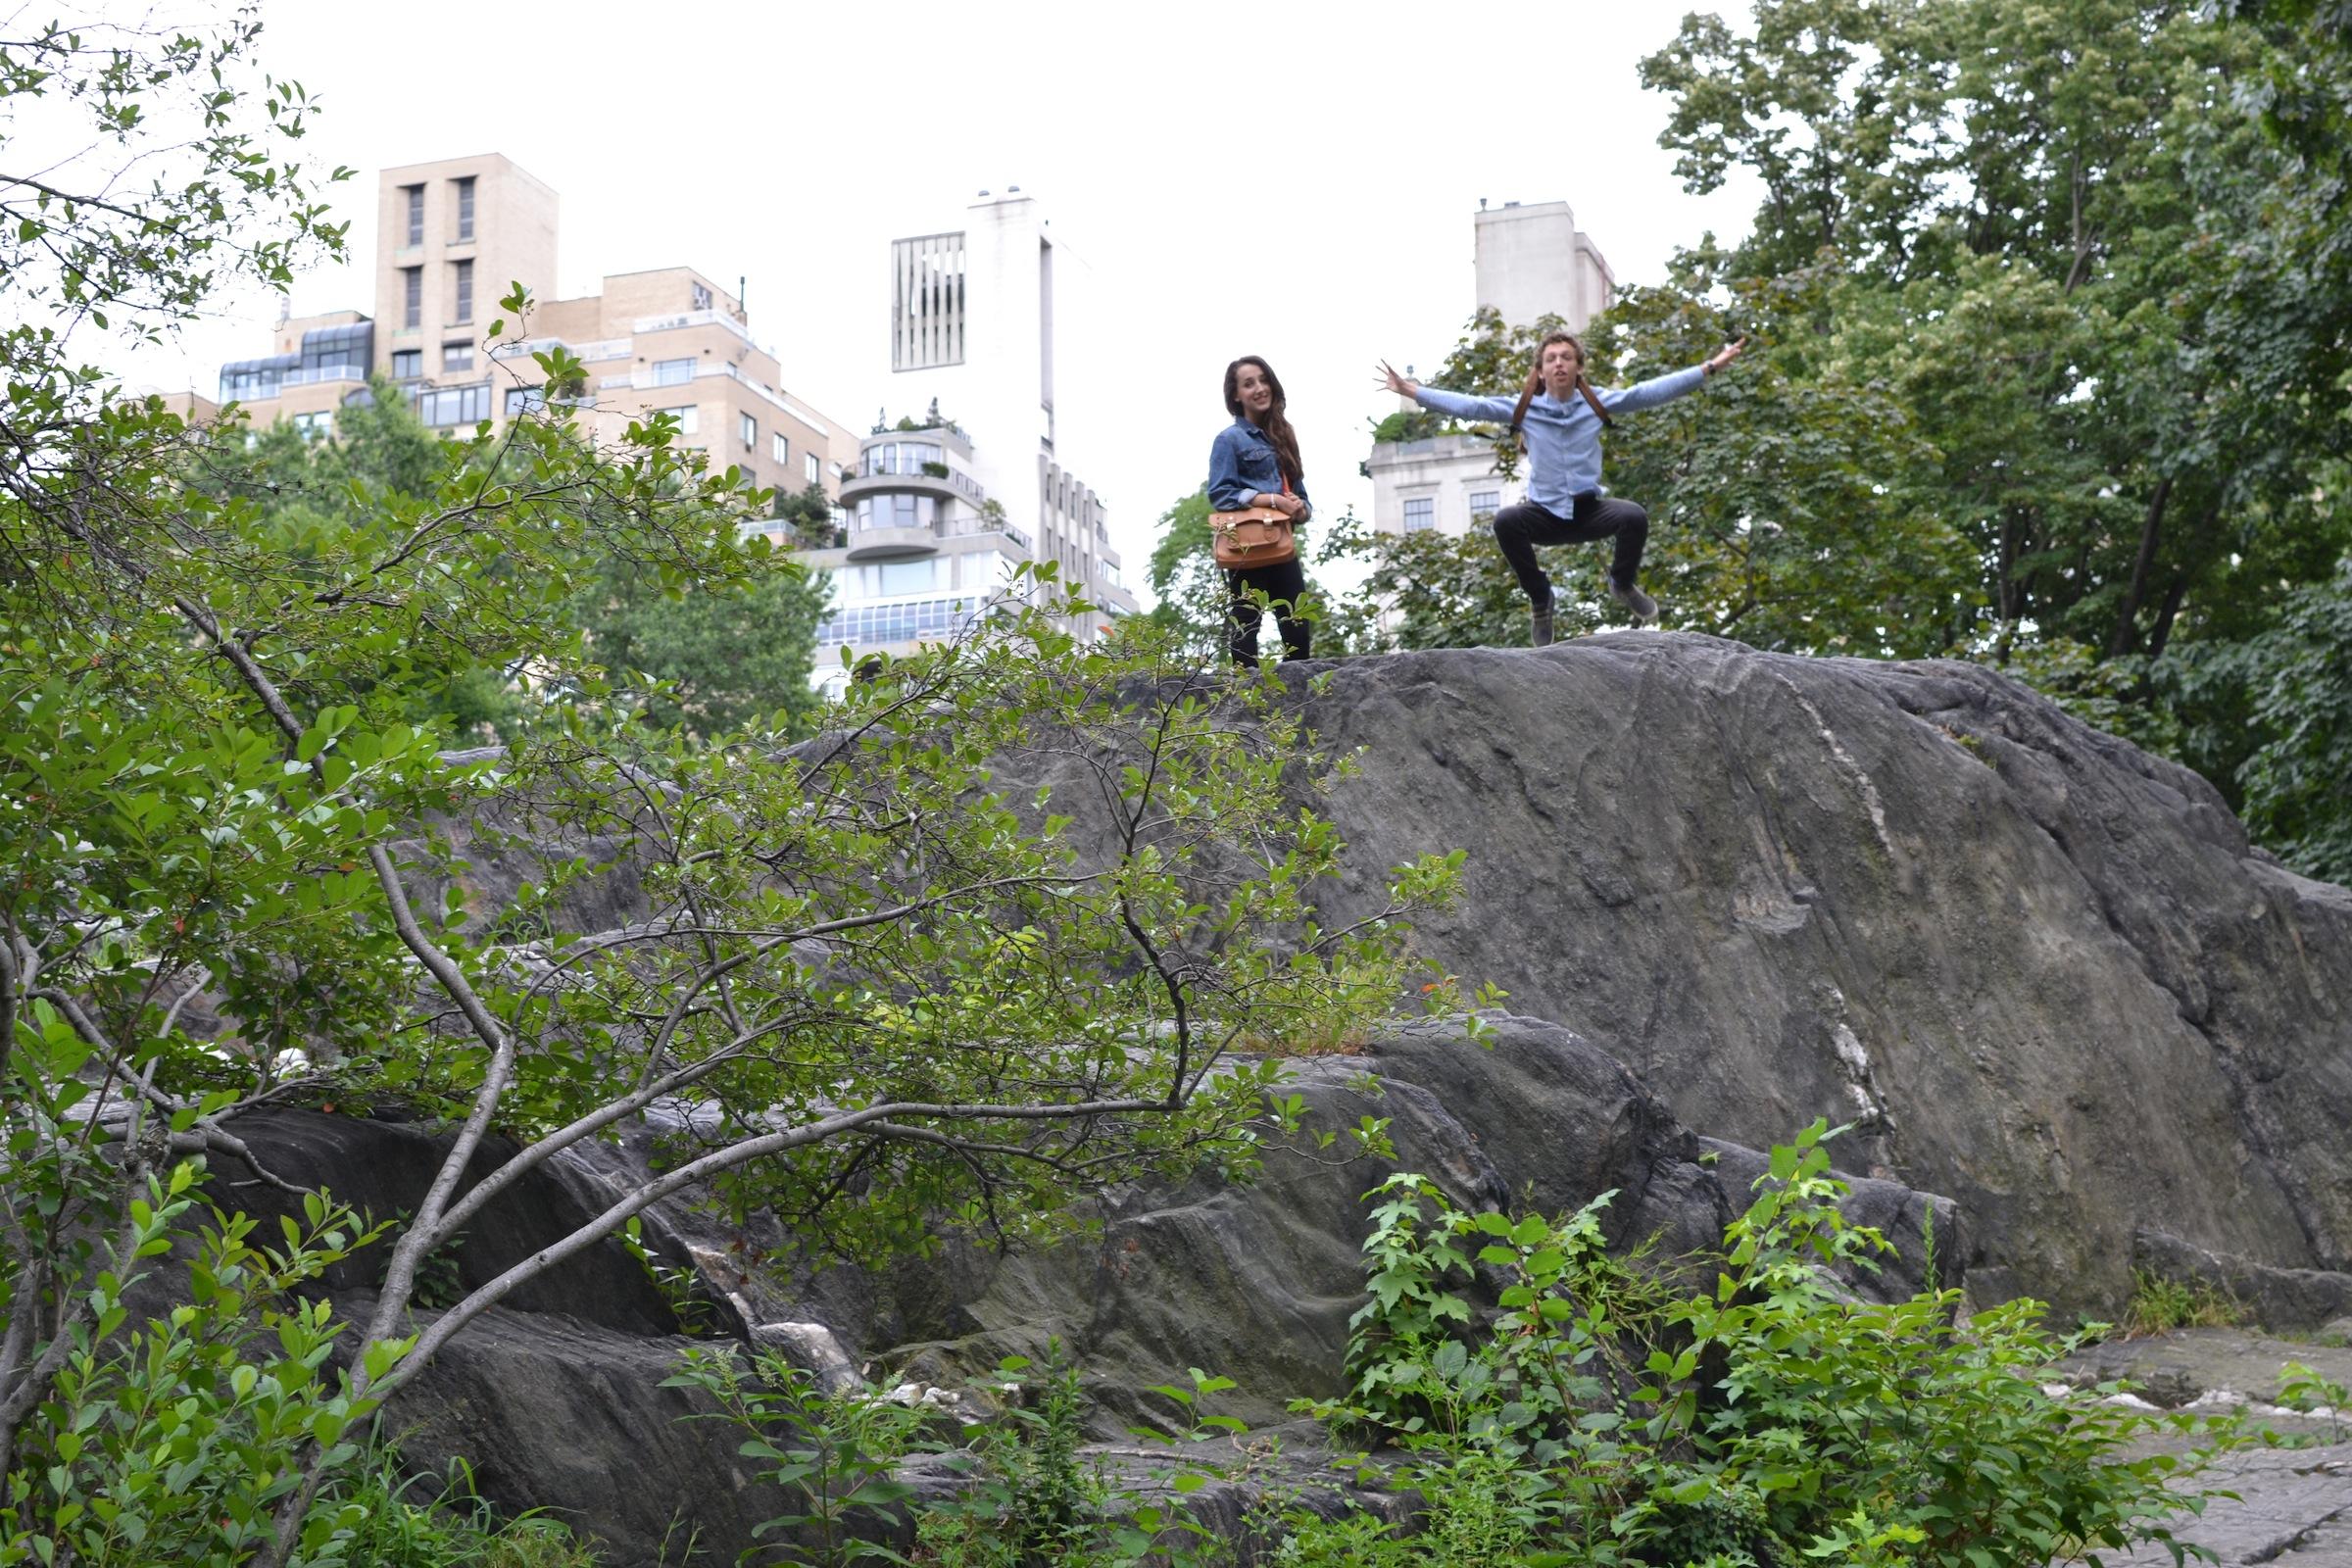 Levitating in Central Park